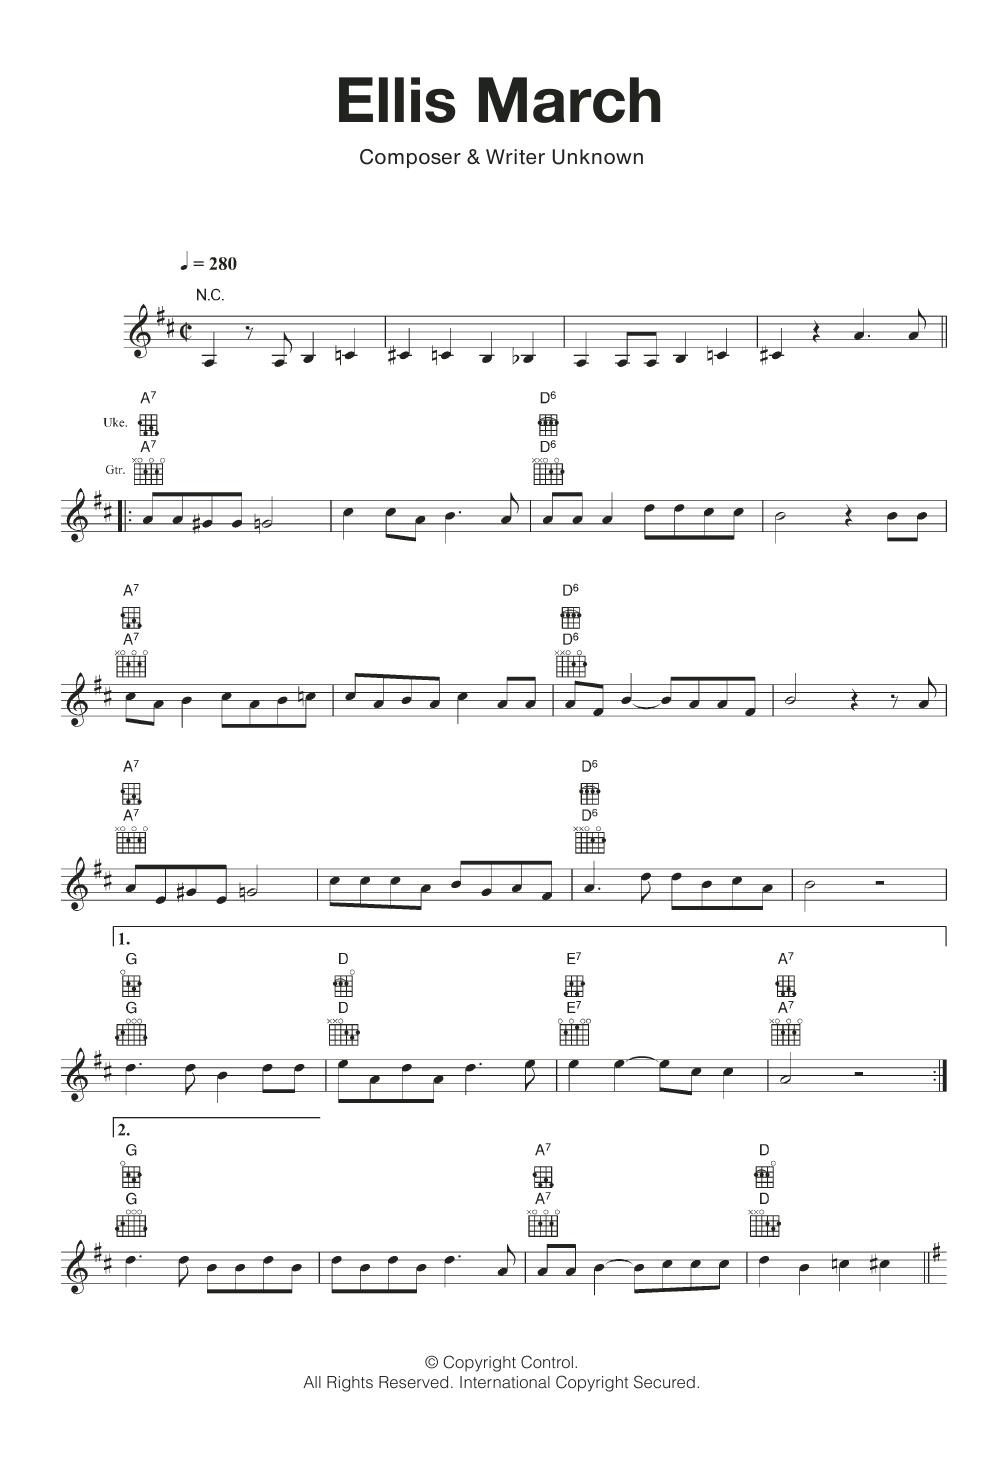 Ellis March Sheet Music